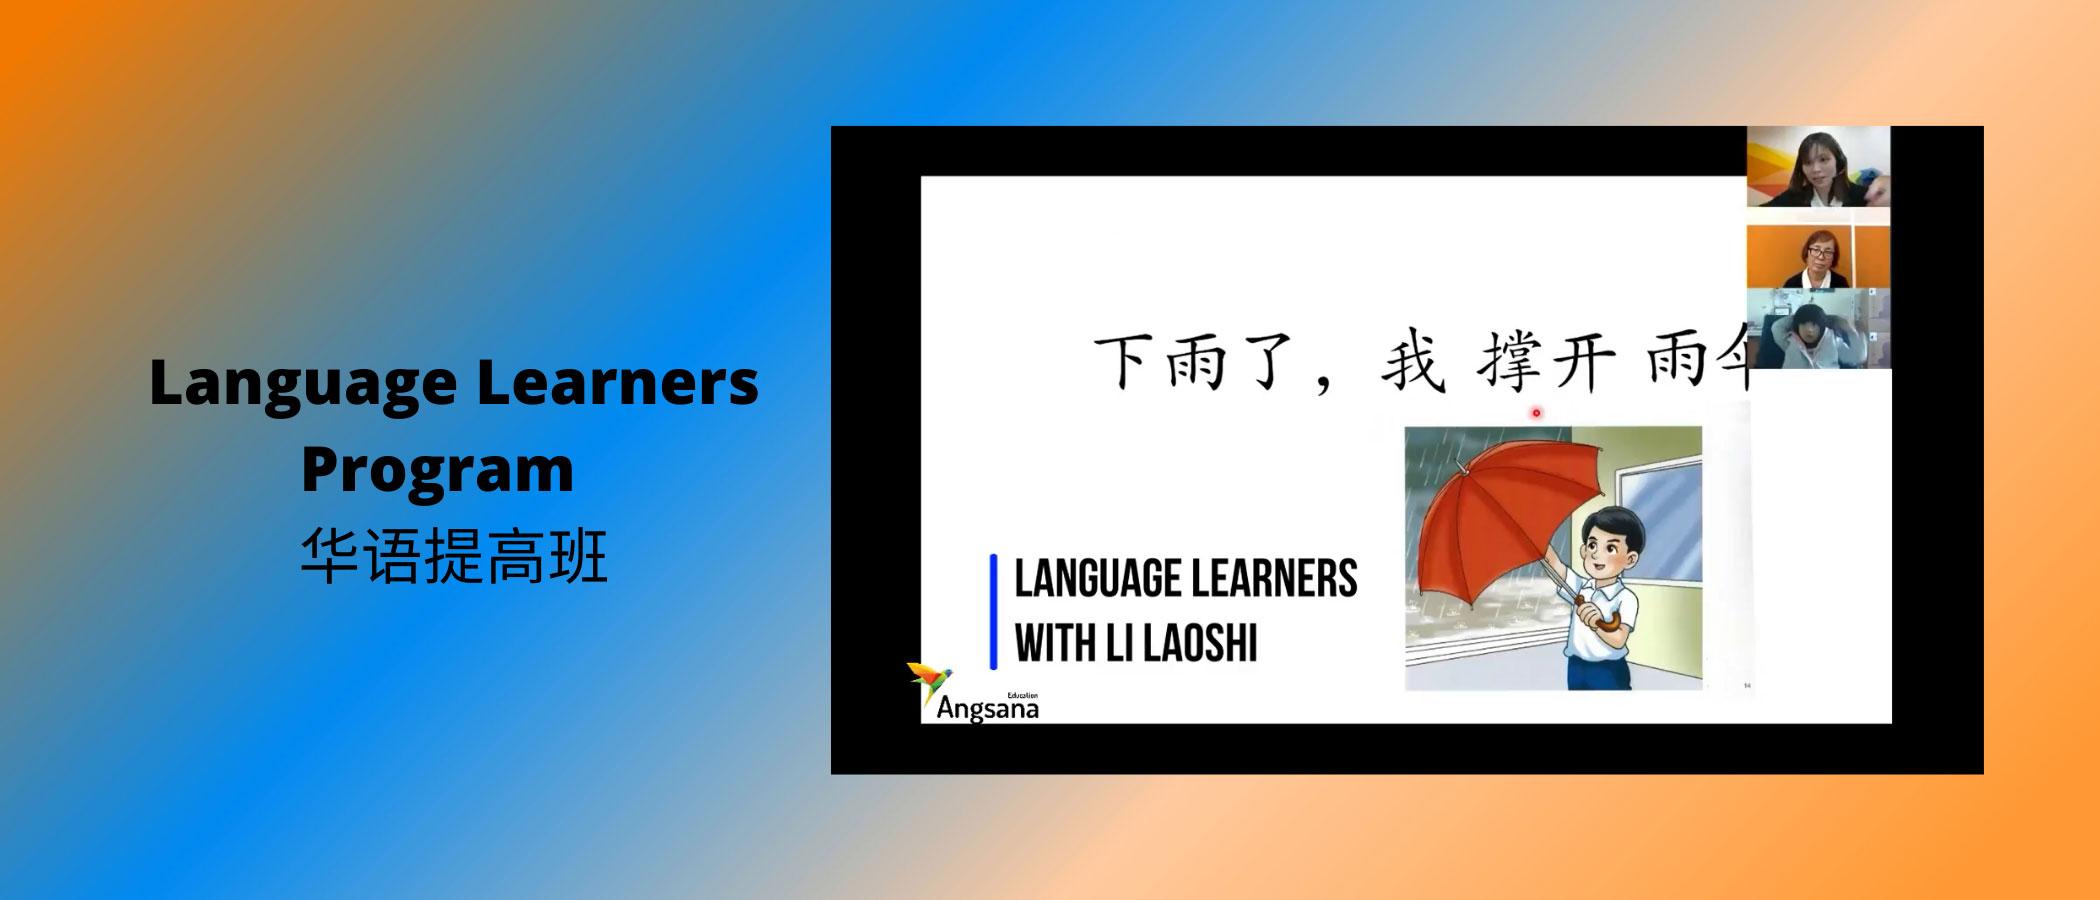 Language Learners